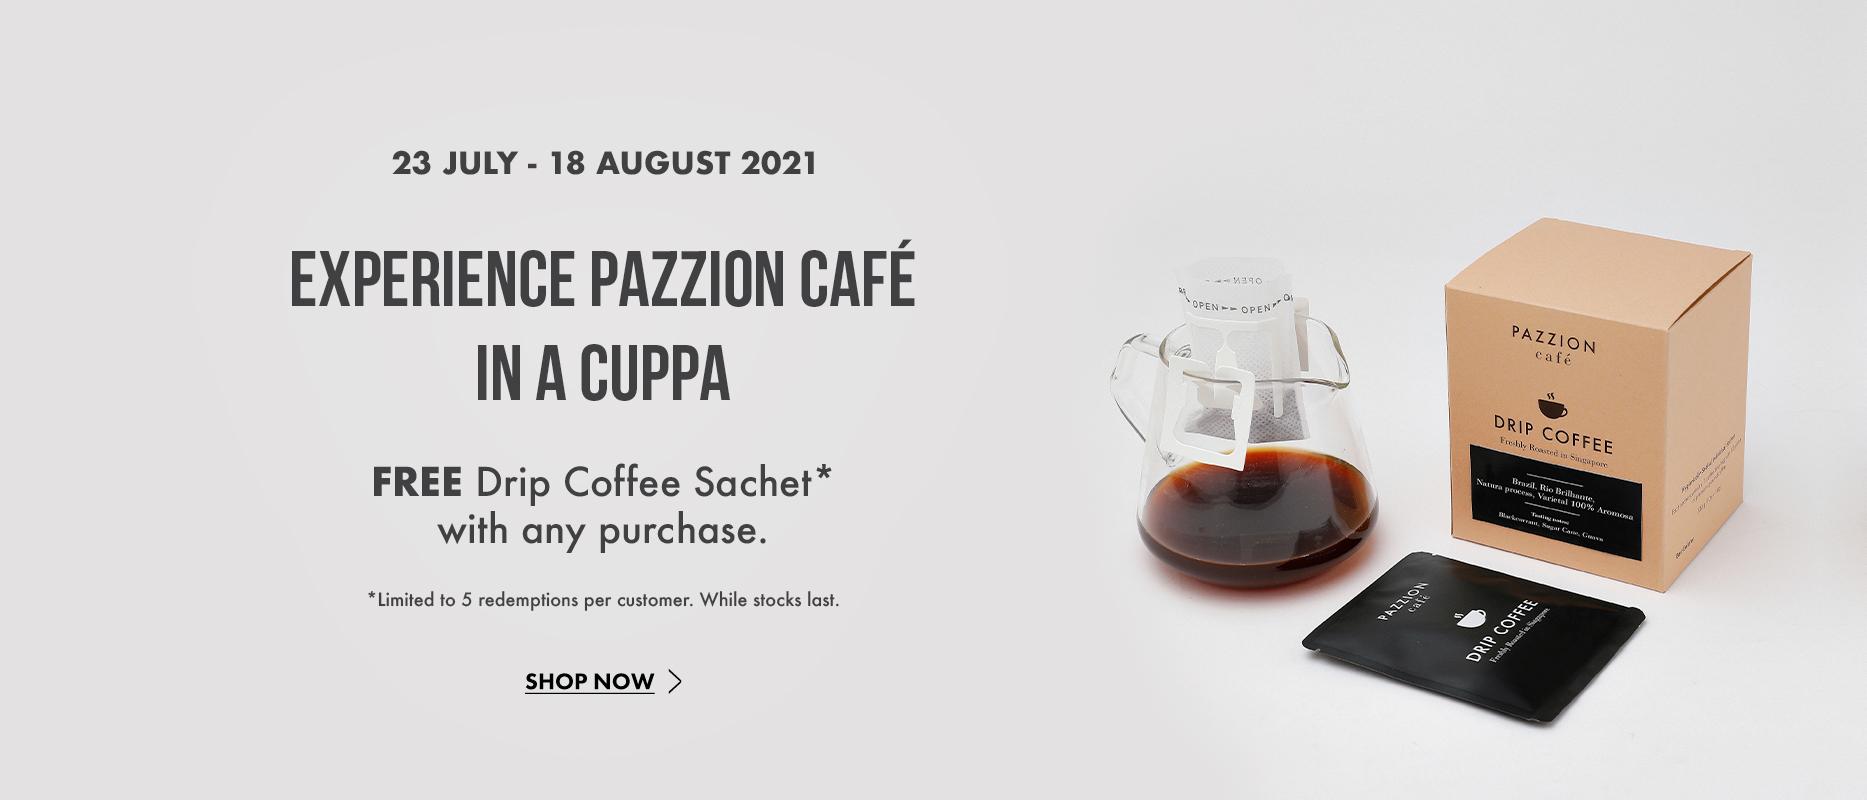 Free Drip Coffee